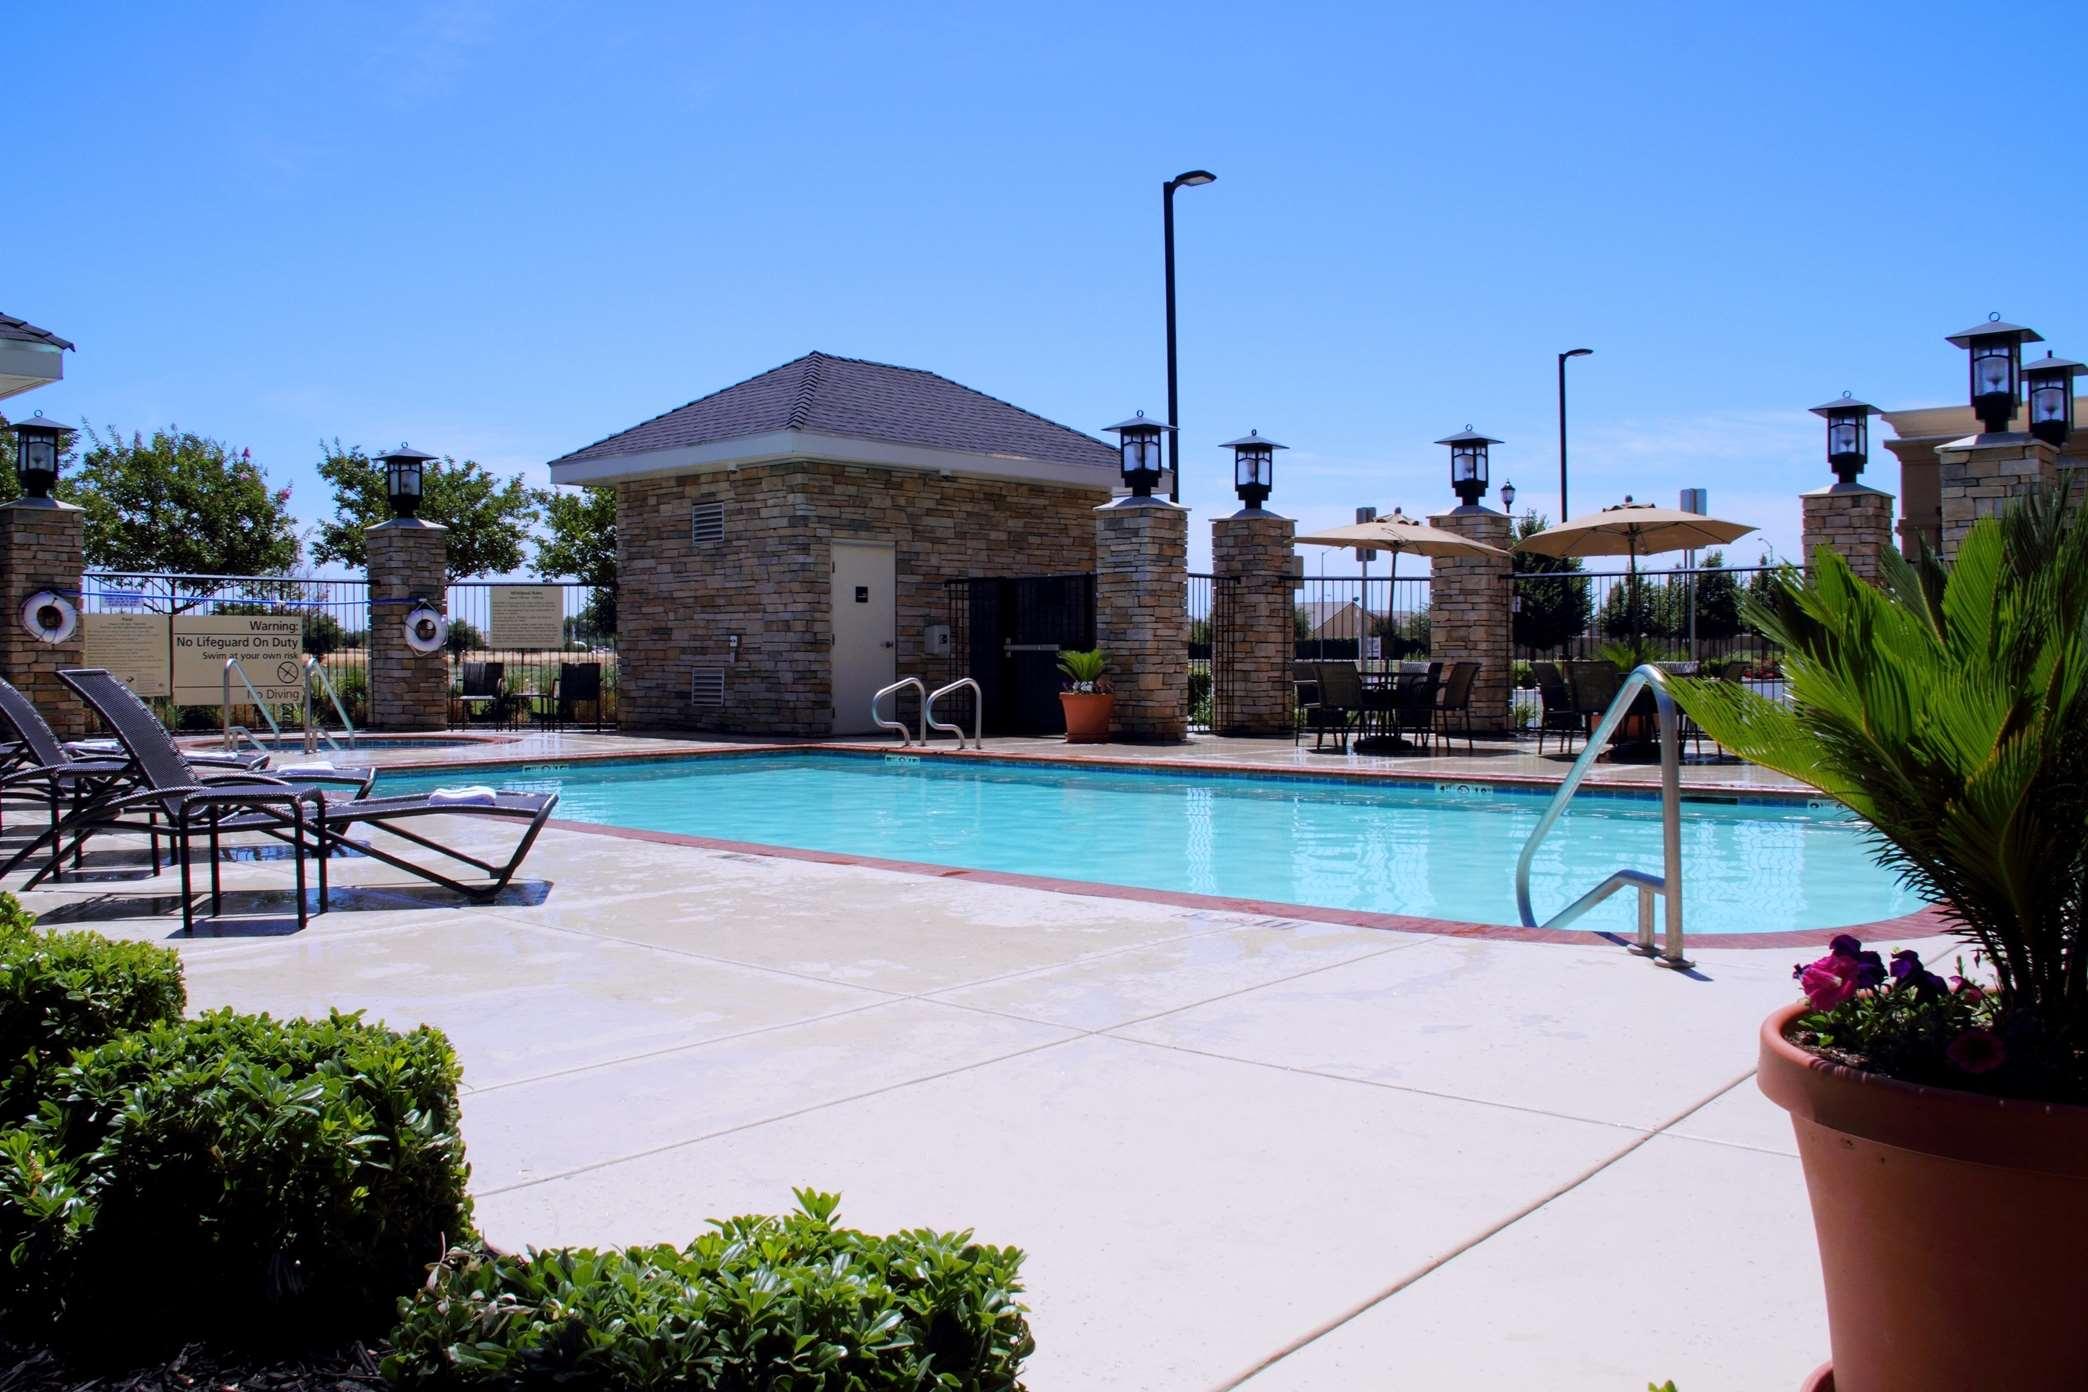 Hampton Inn & Suites Manteca image 13